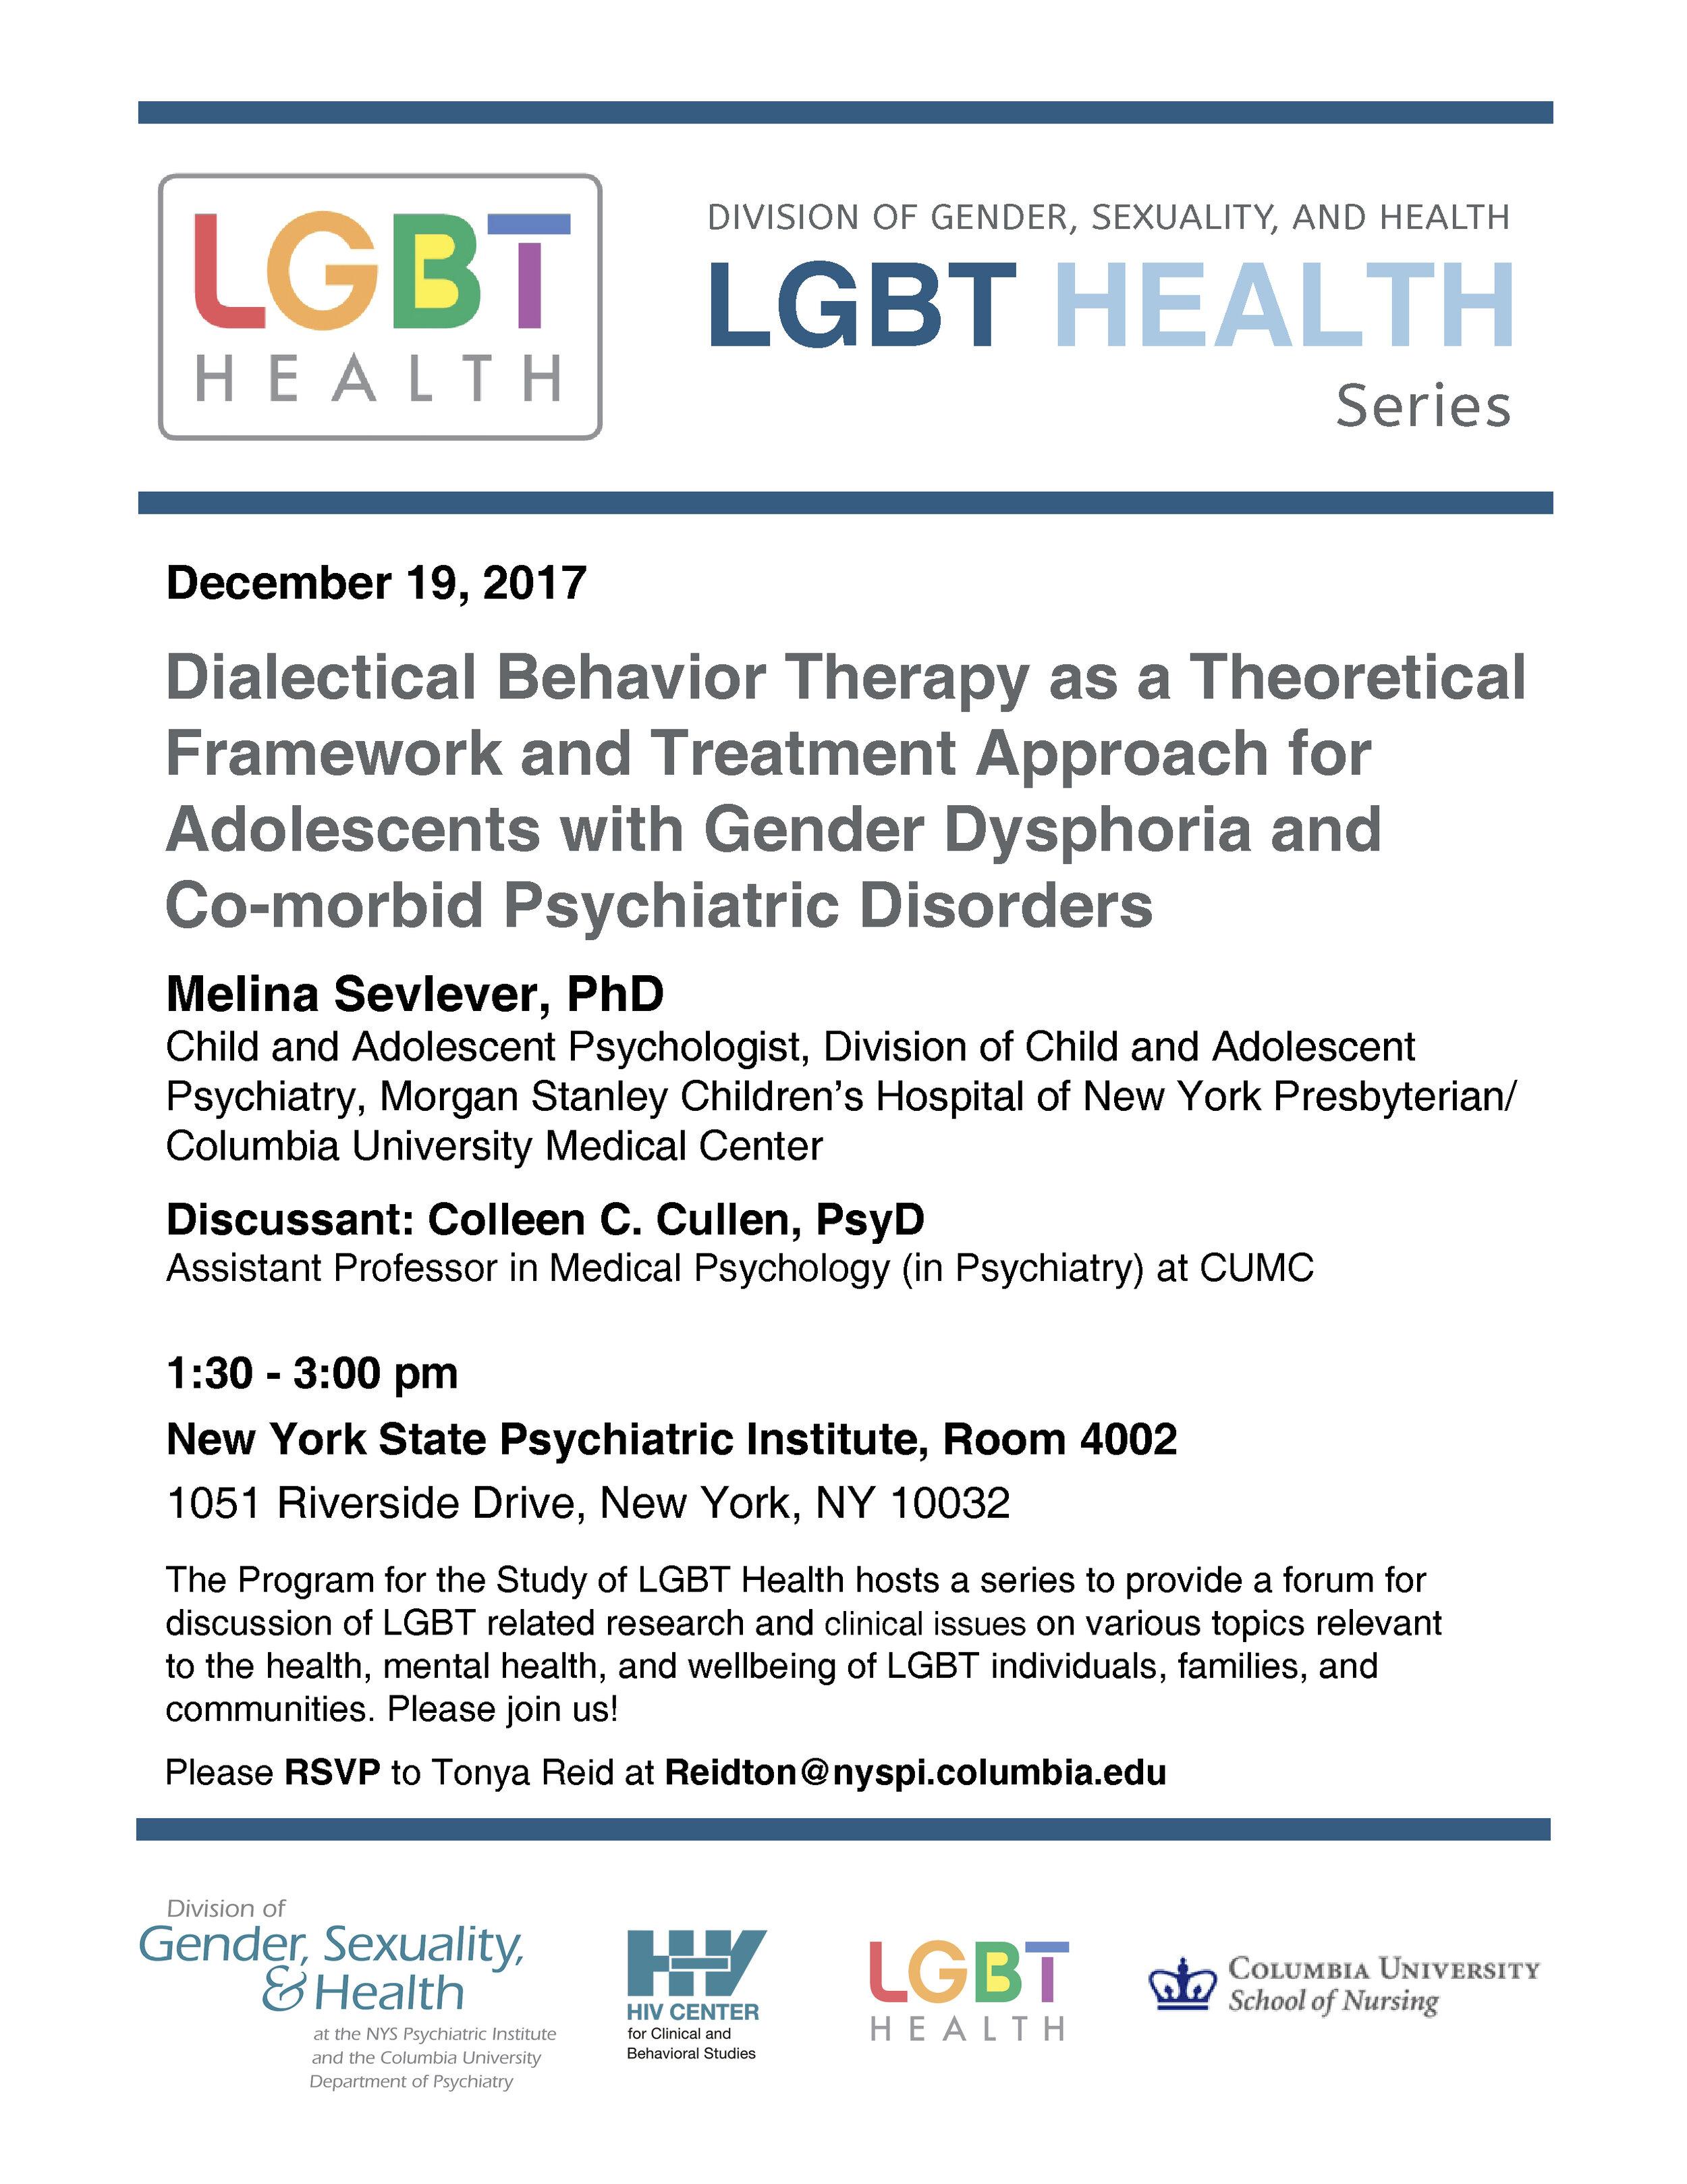 LGBT Health Series Dec 19 2017.jpg